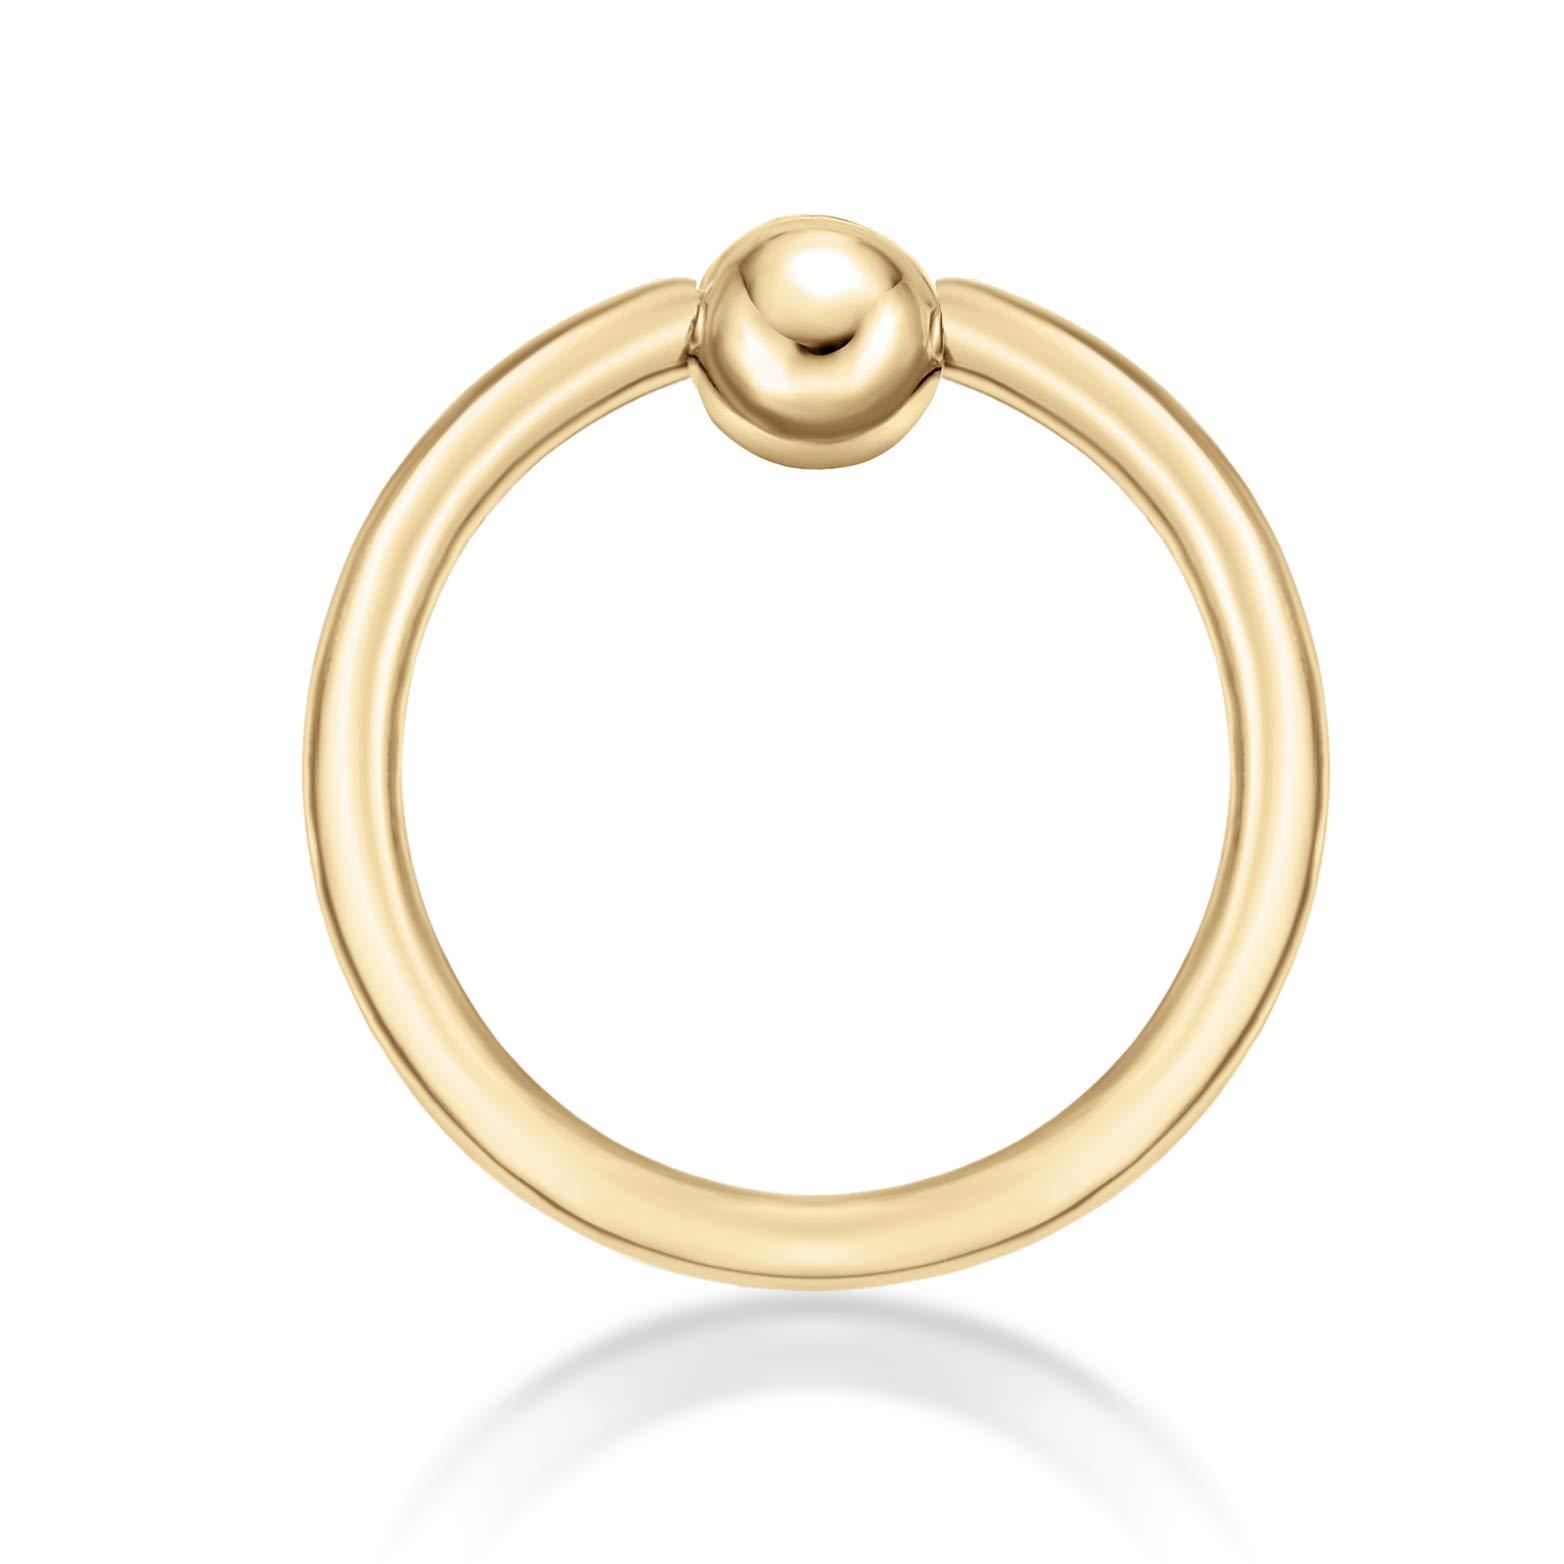 Lavari - 14K Yellow Gold Captive Bead Hoop Lip Eyebrow Belly Nipple Ring 16G 3/8'' by Lavari Jewelers